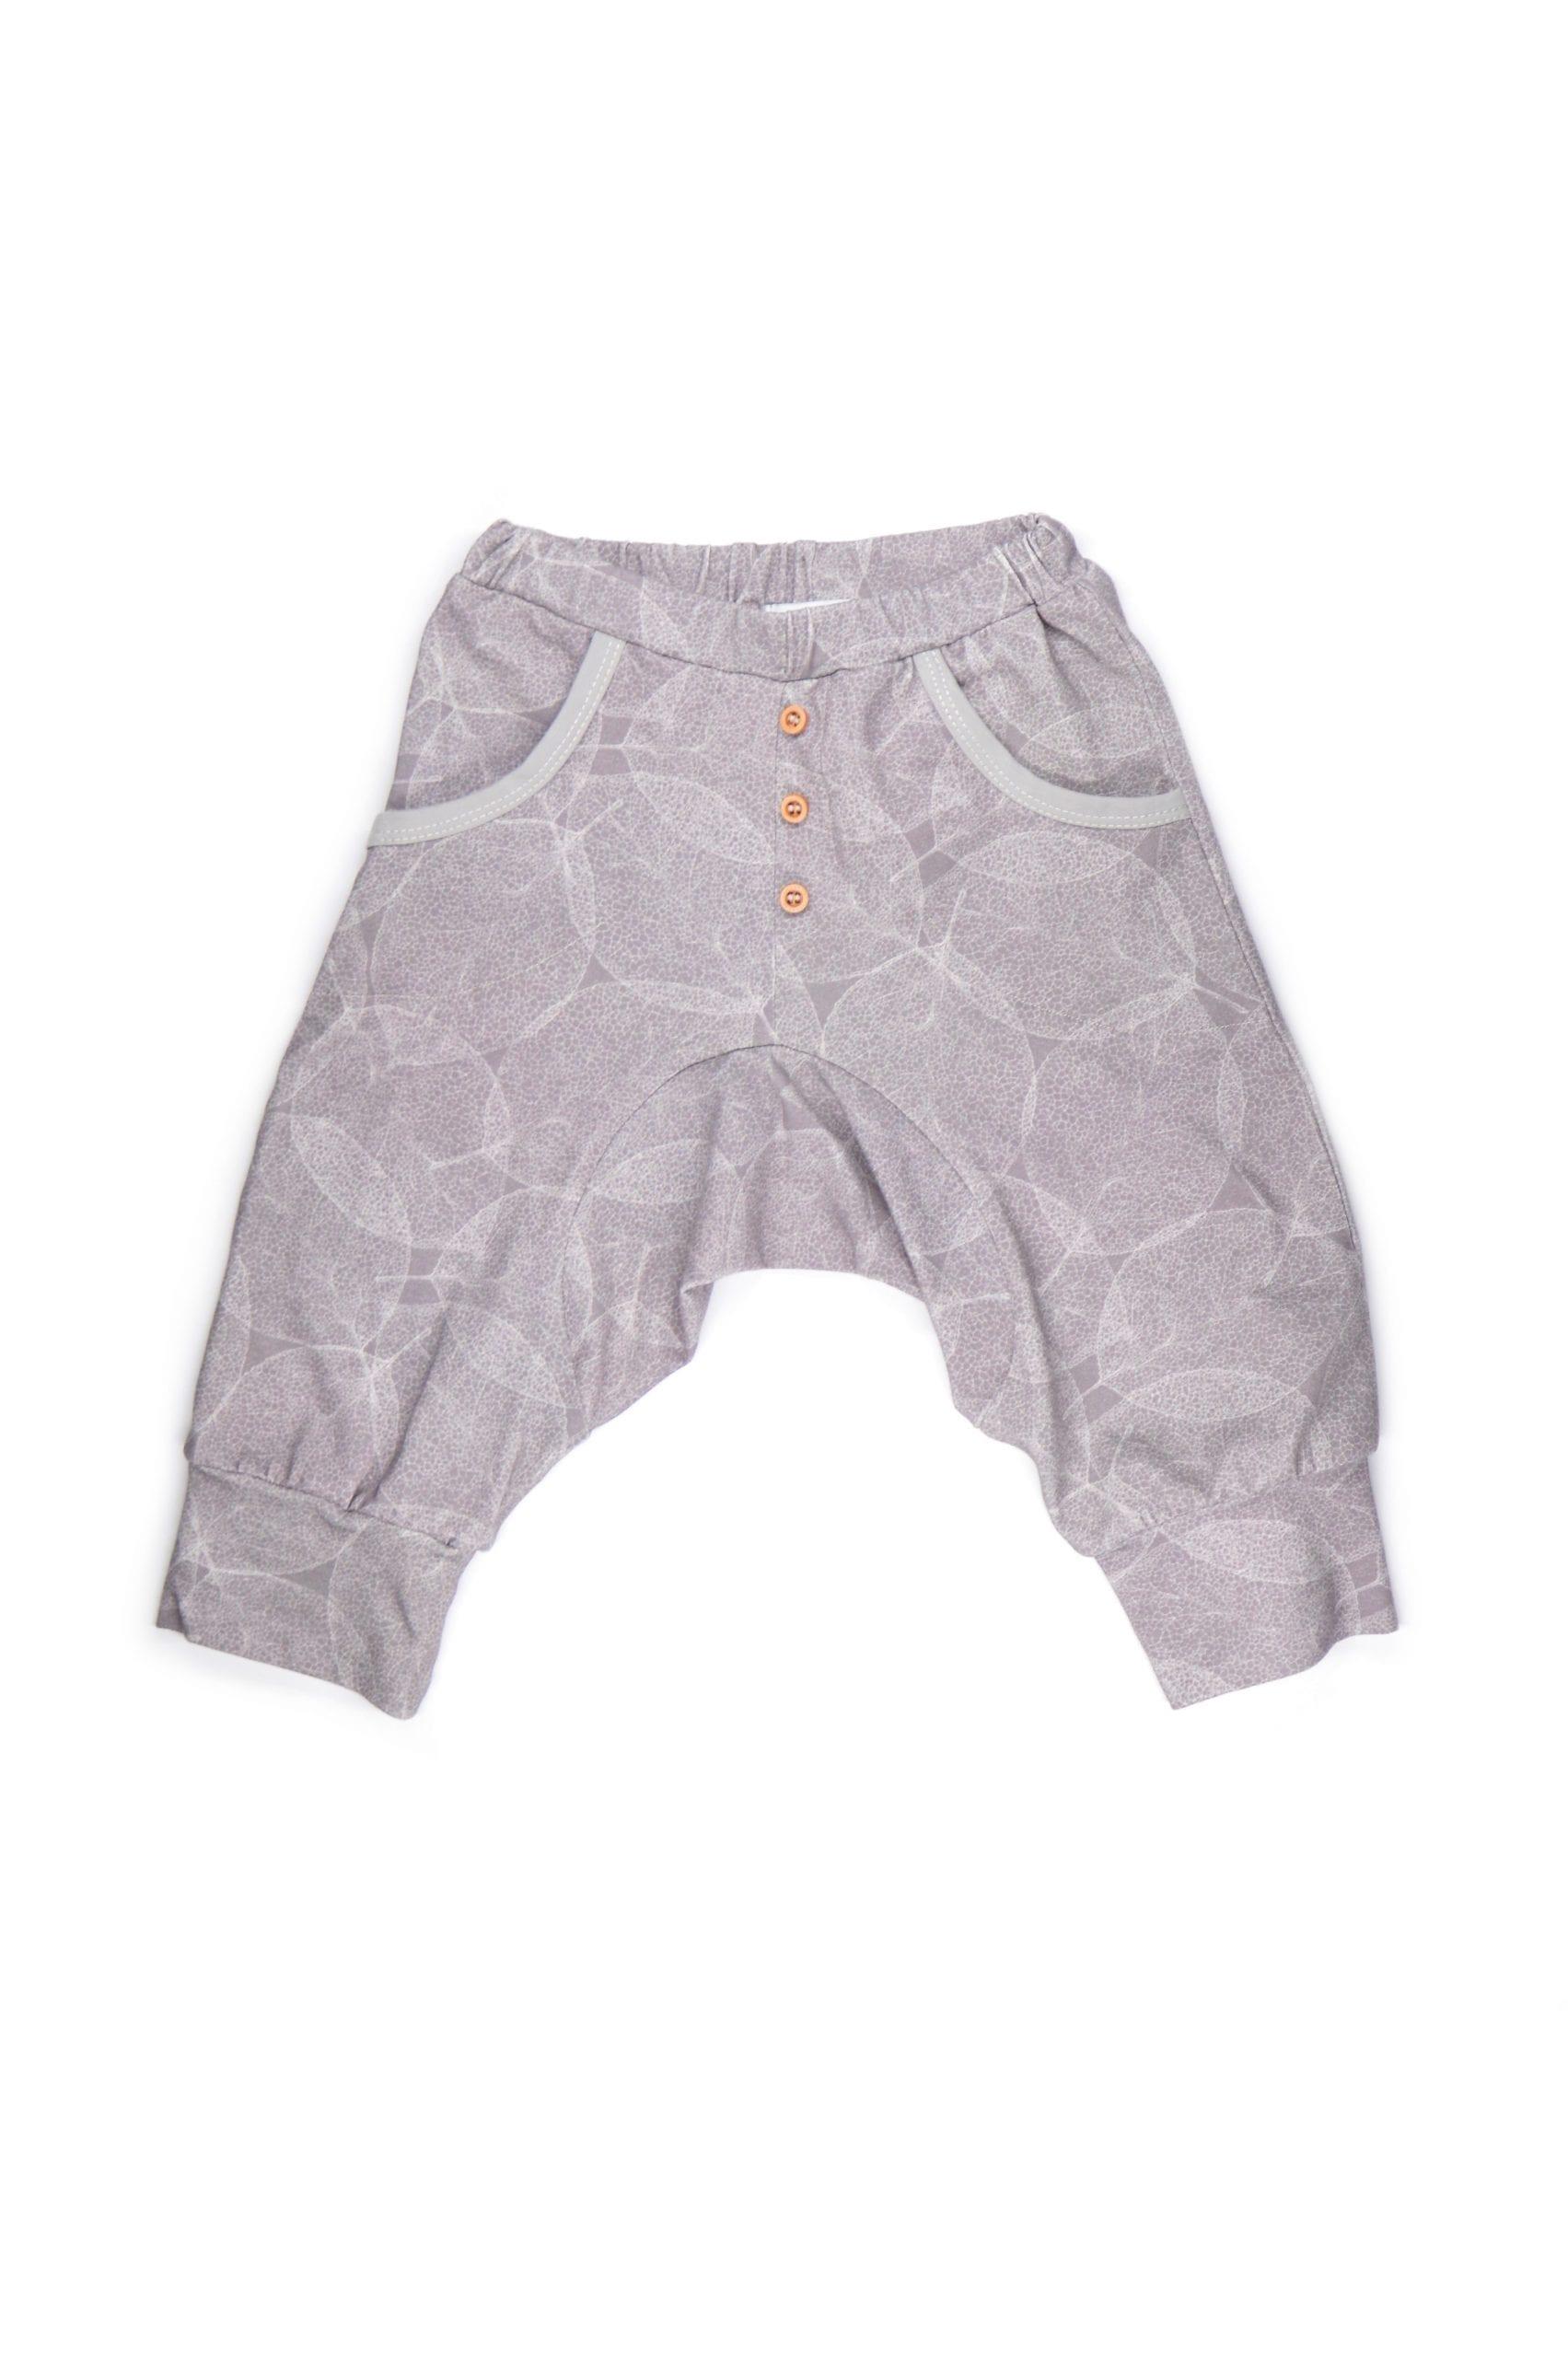 Dark leaf harem shorts for toddlers, boys, unisex, girls, baby